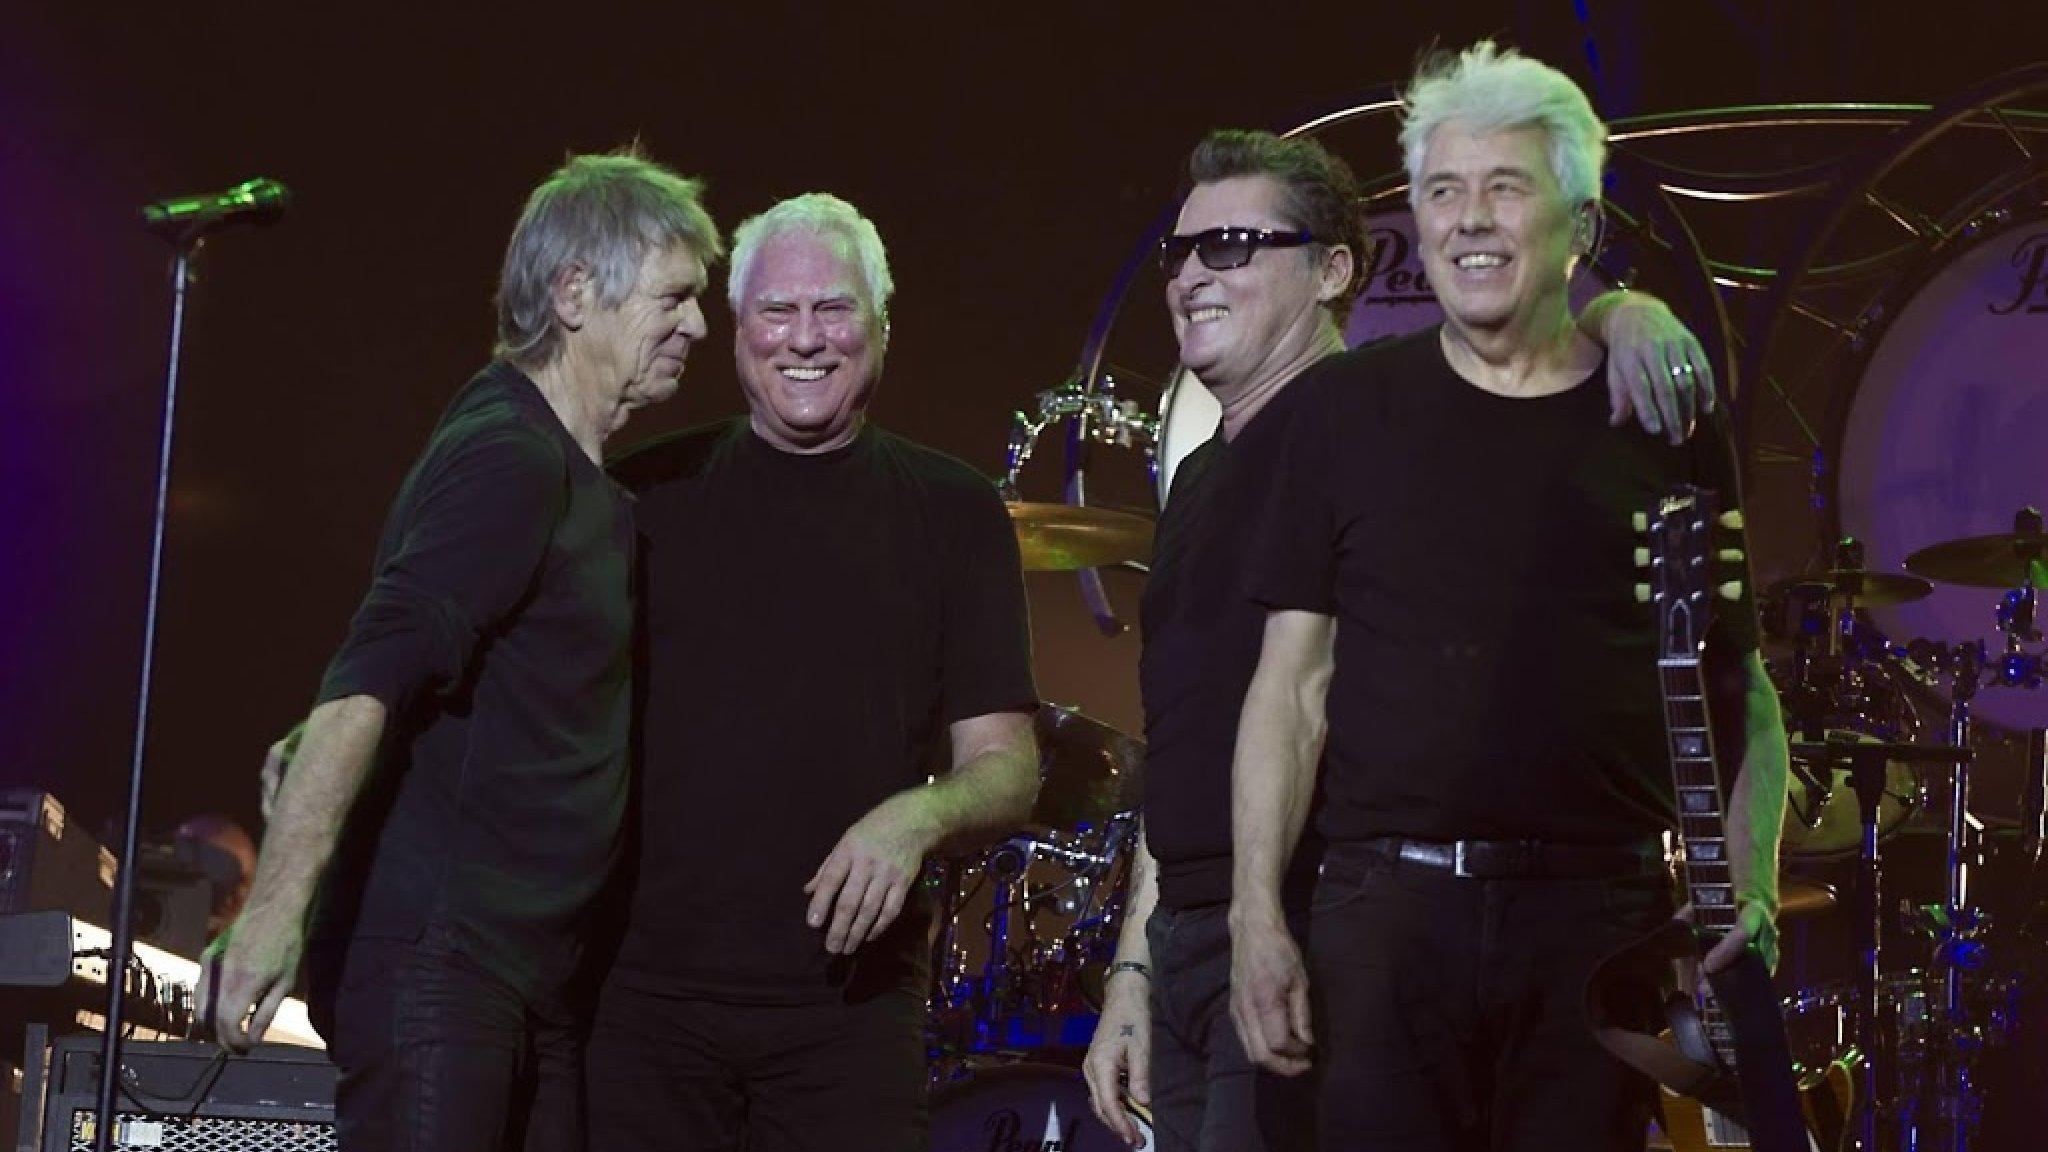 Golden Earring: No longer the oldest Dutch rock band